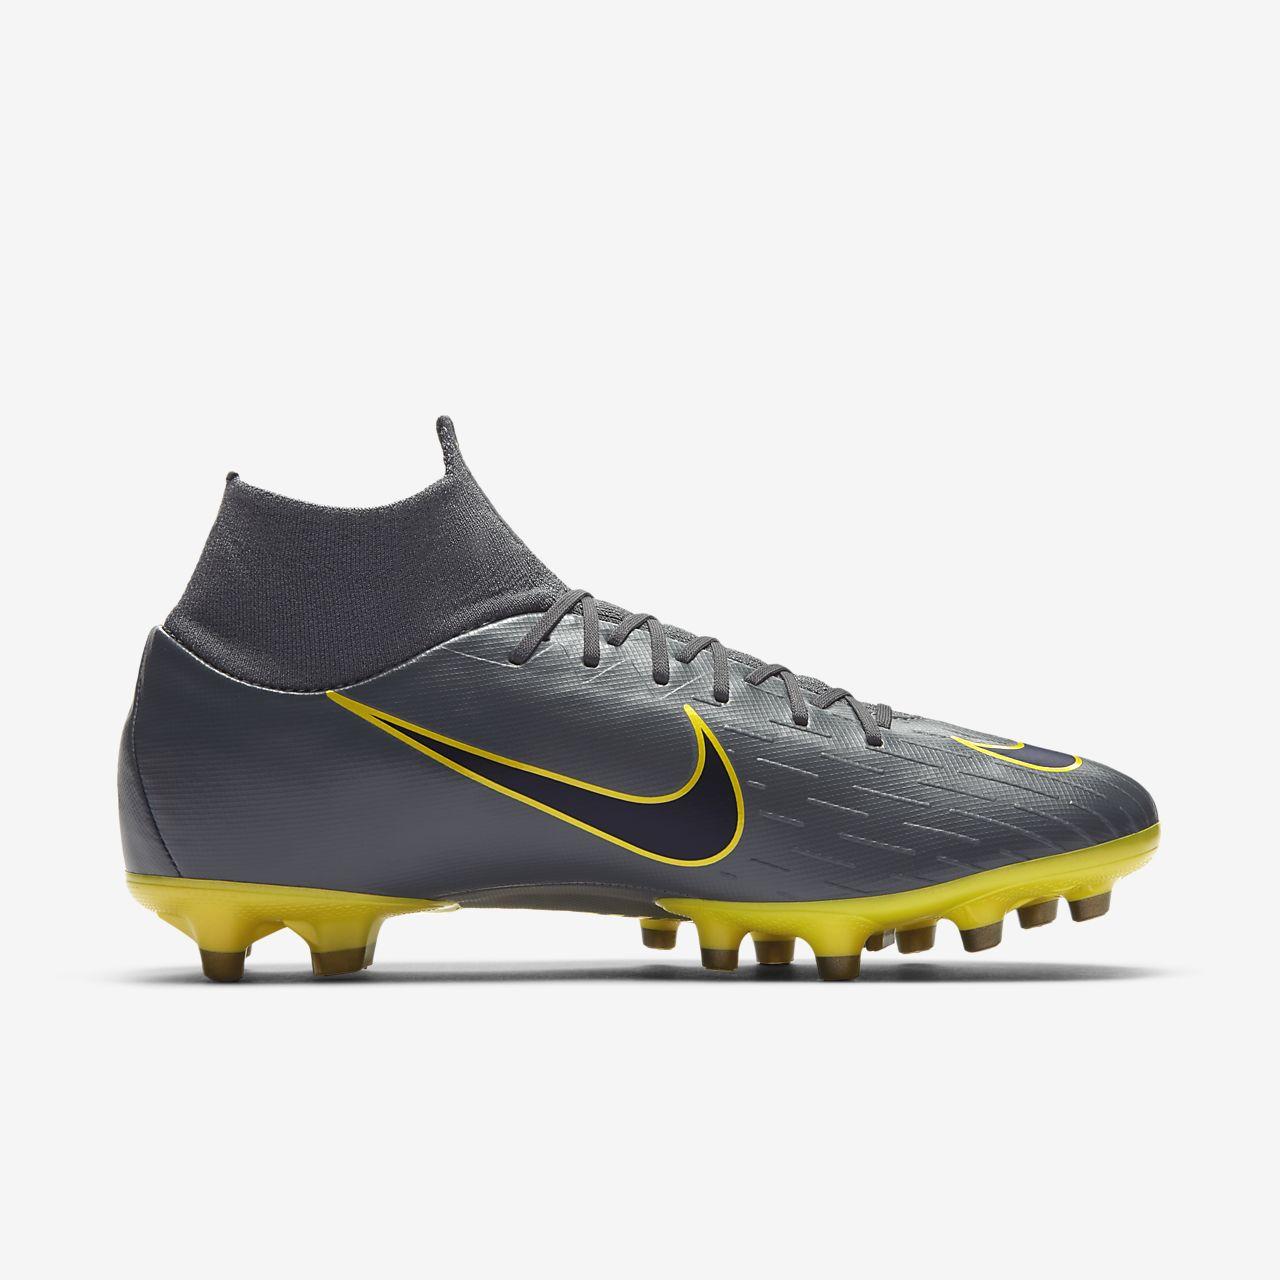 84824a45ce475 ... Nike Mercurial Superfly VI Pro AG-PRO Botas de fútbol para césped  artificial